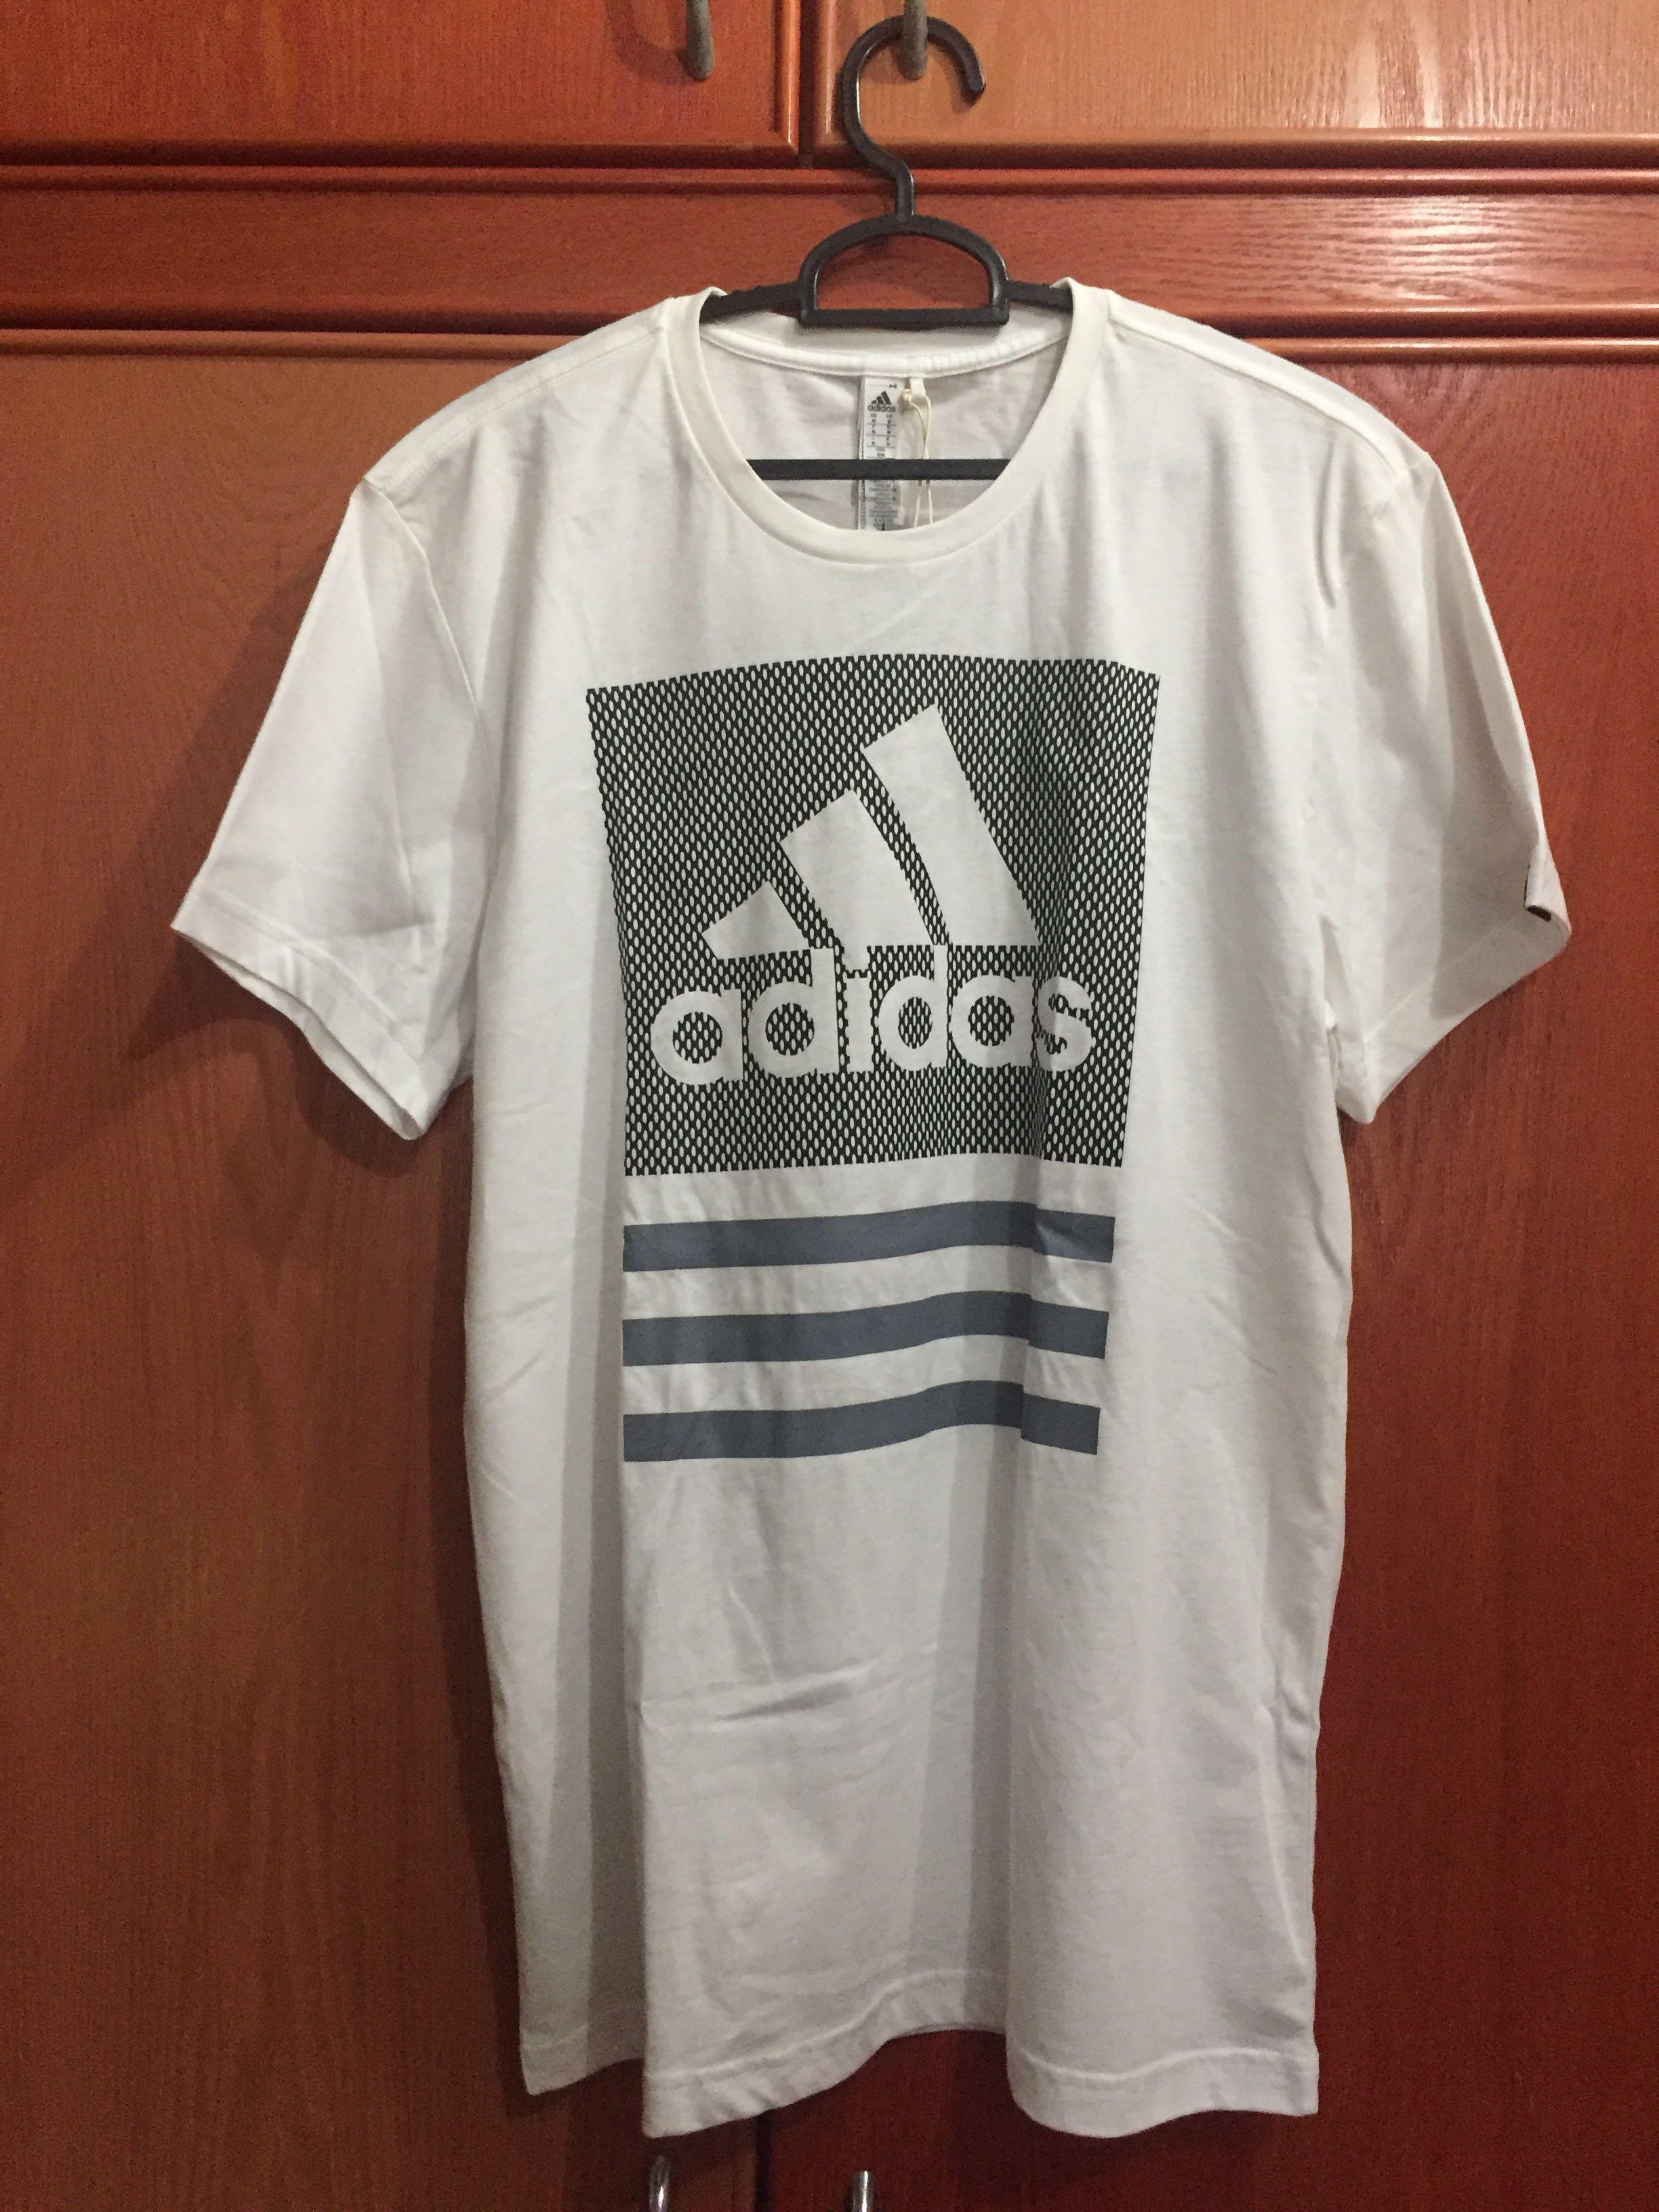 adidas shirt singapore